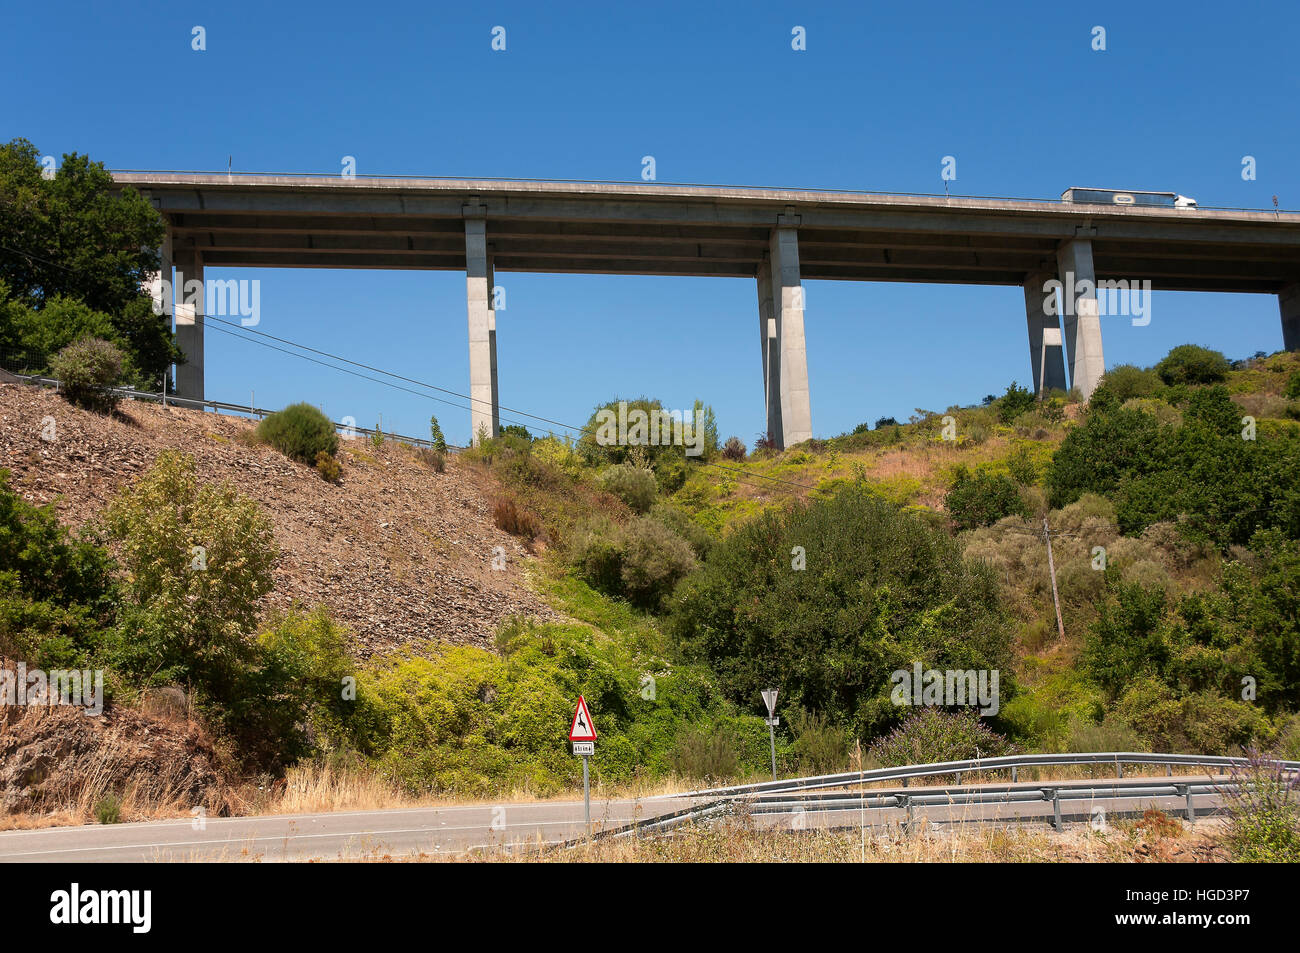 Viaduct, Becerrea, Lugo province, Region of Galicia, Spain, Europe - Stock Image